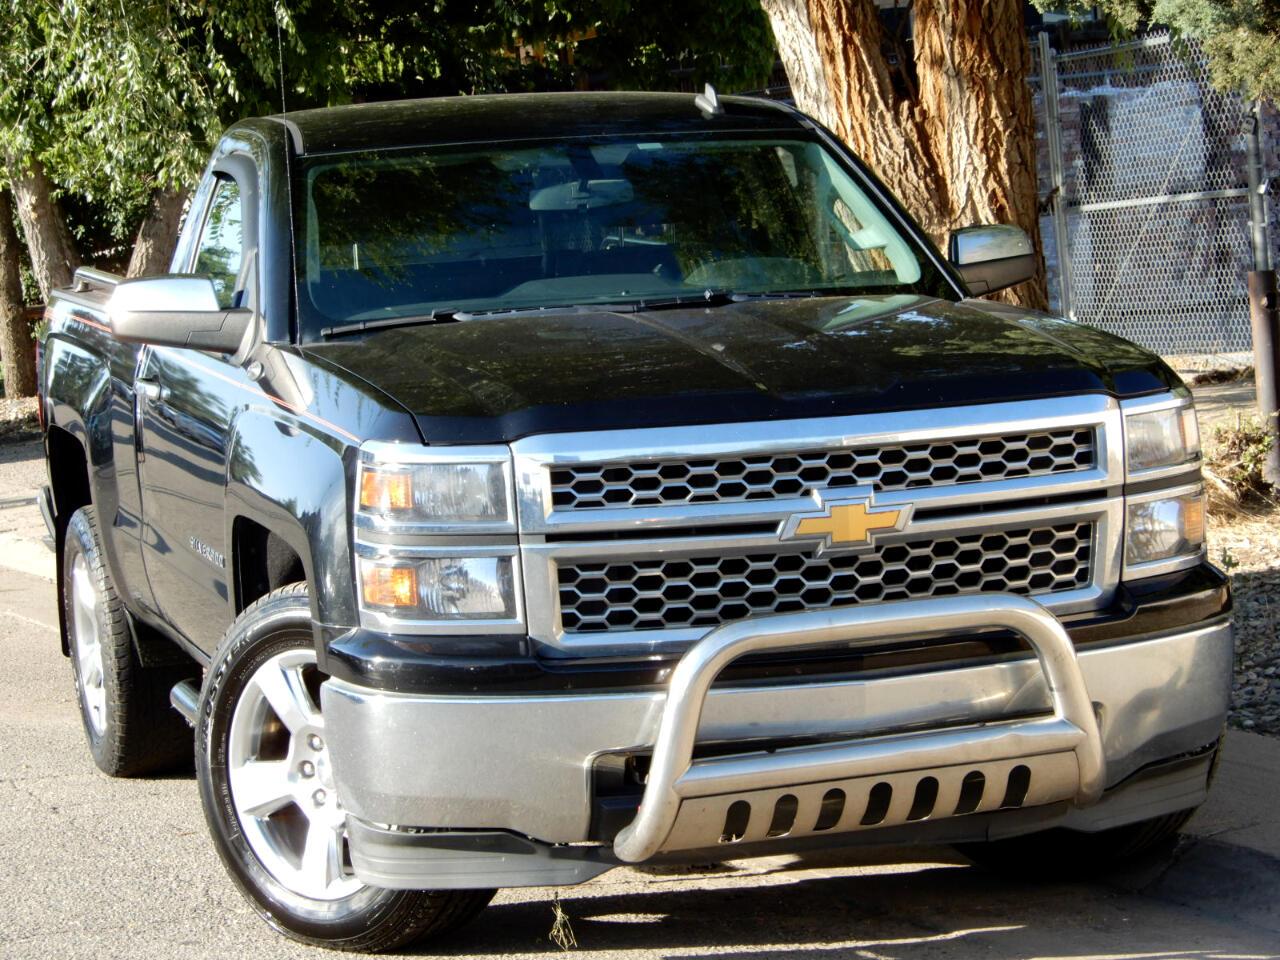 2014 Chevrolet Silverado 1500 1LT Regular Cab 4WD